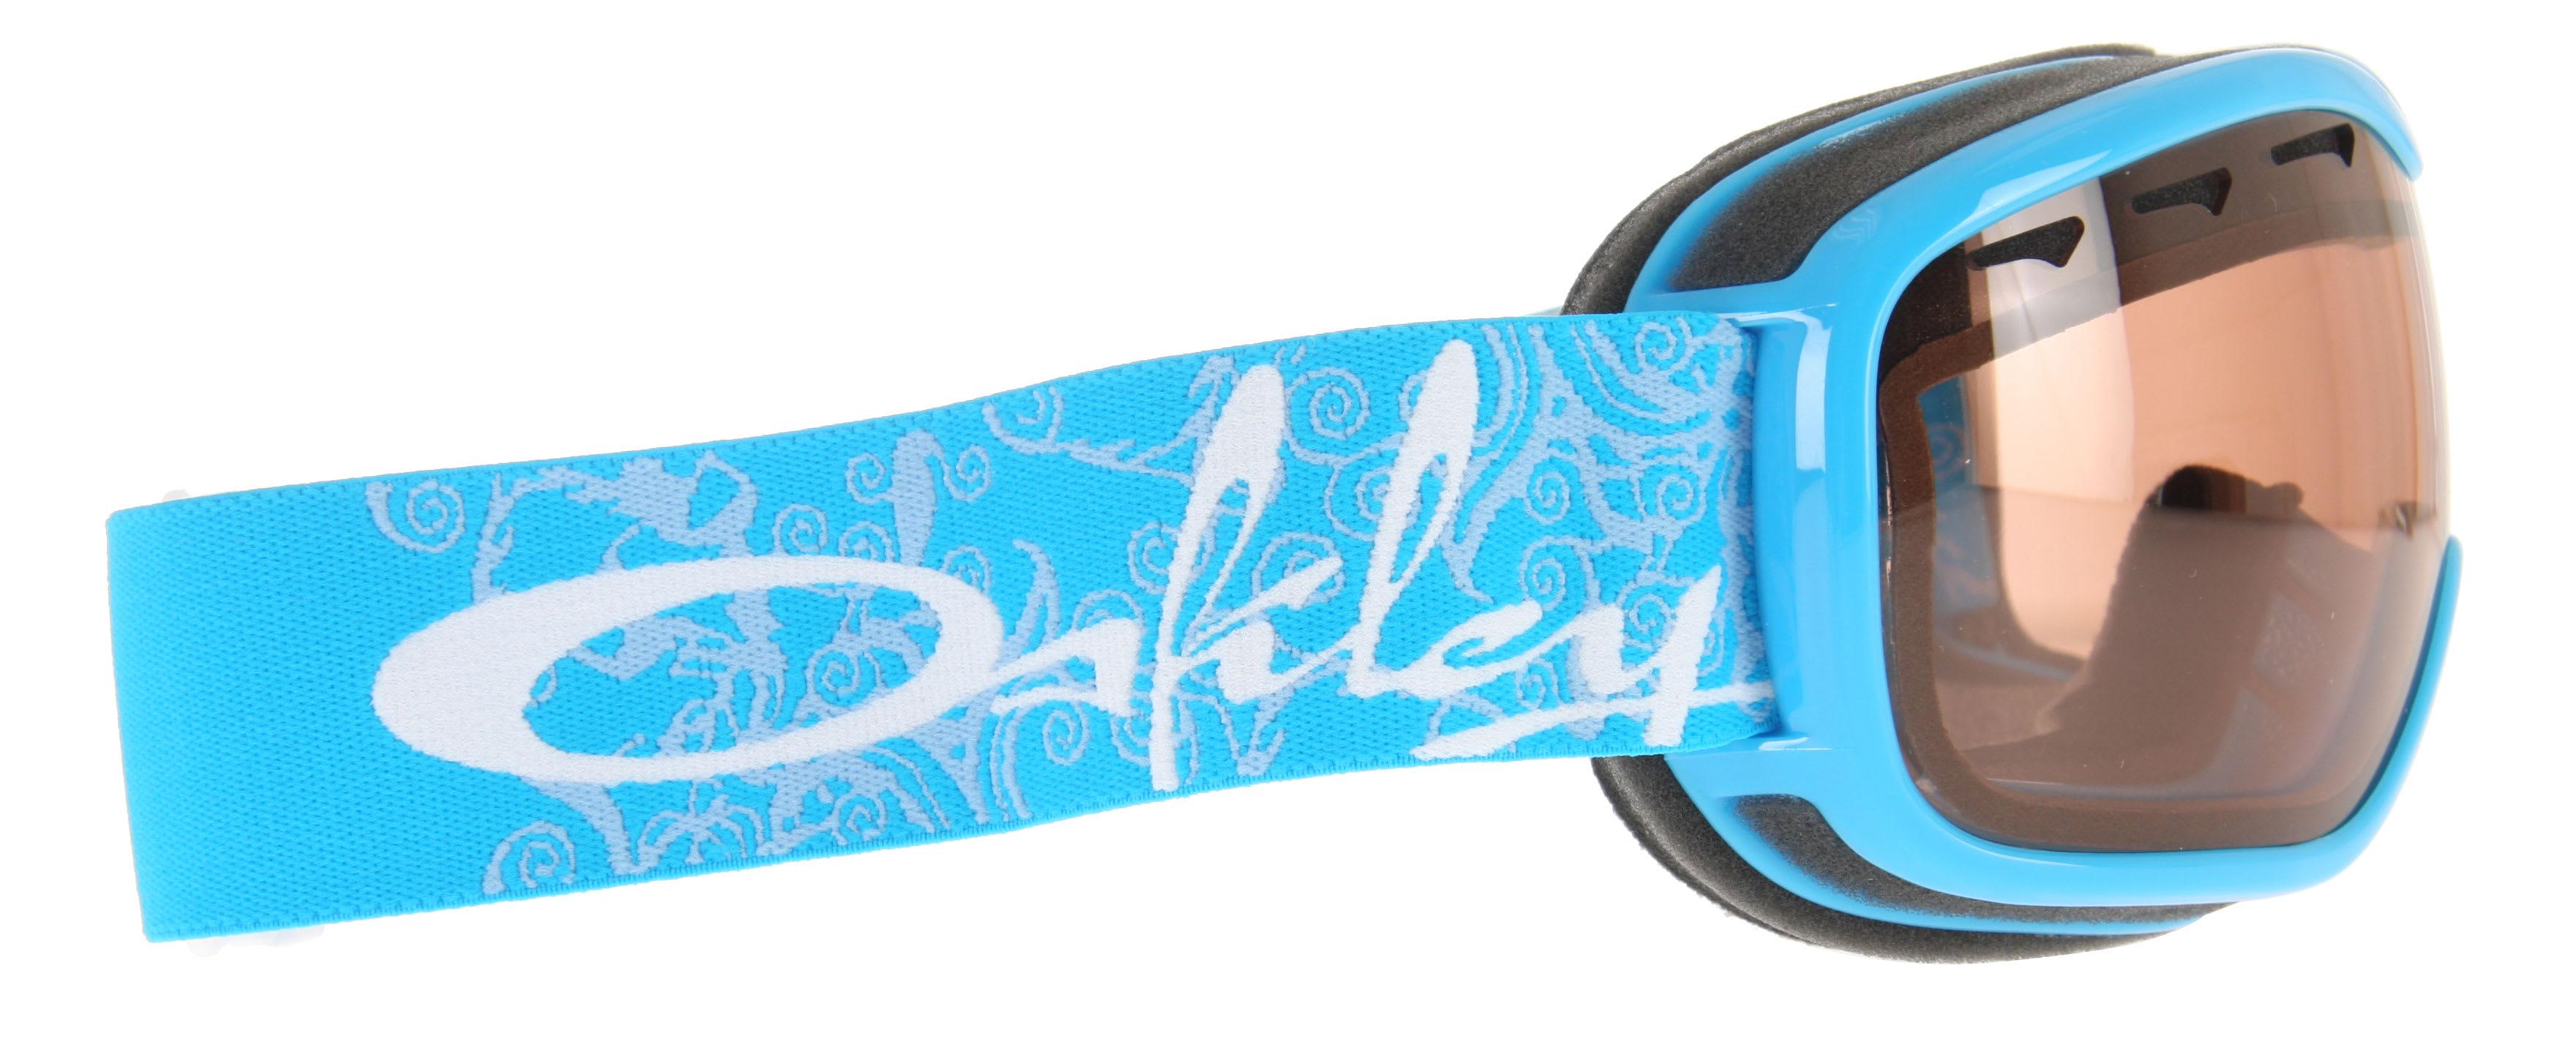 8f32a5f0b9348 Oakley Stockholm Goggles - thumbnail 2